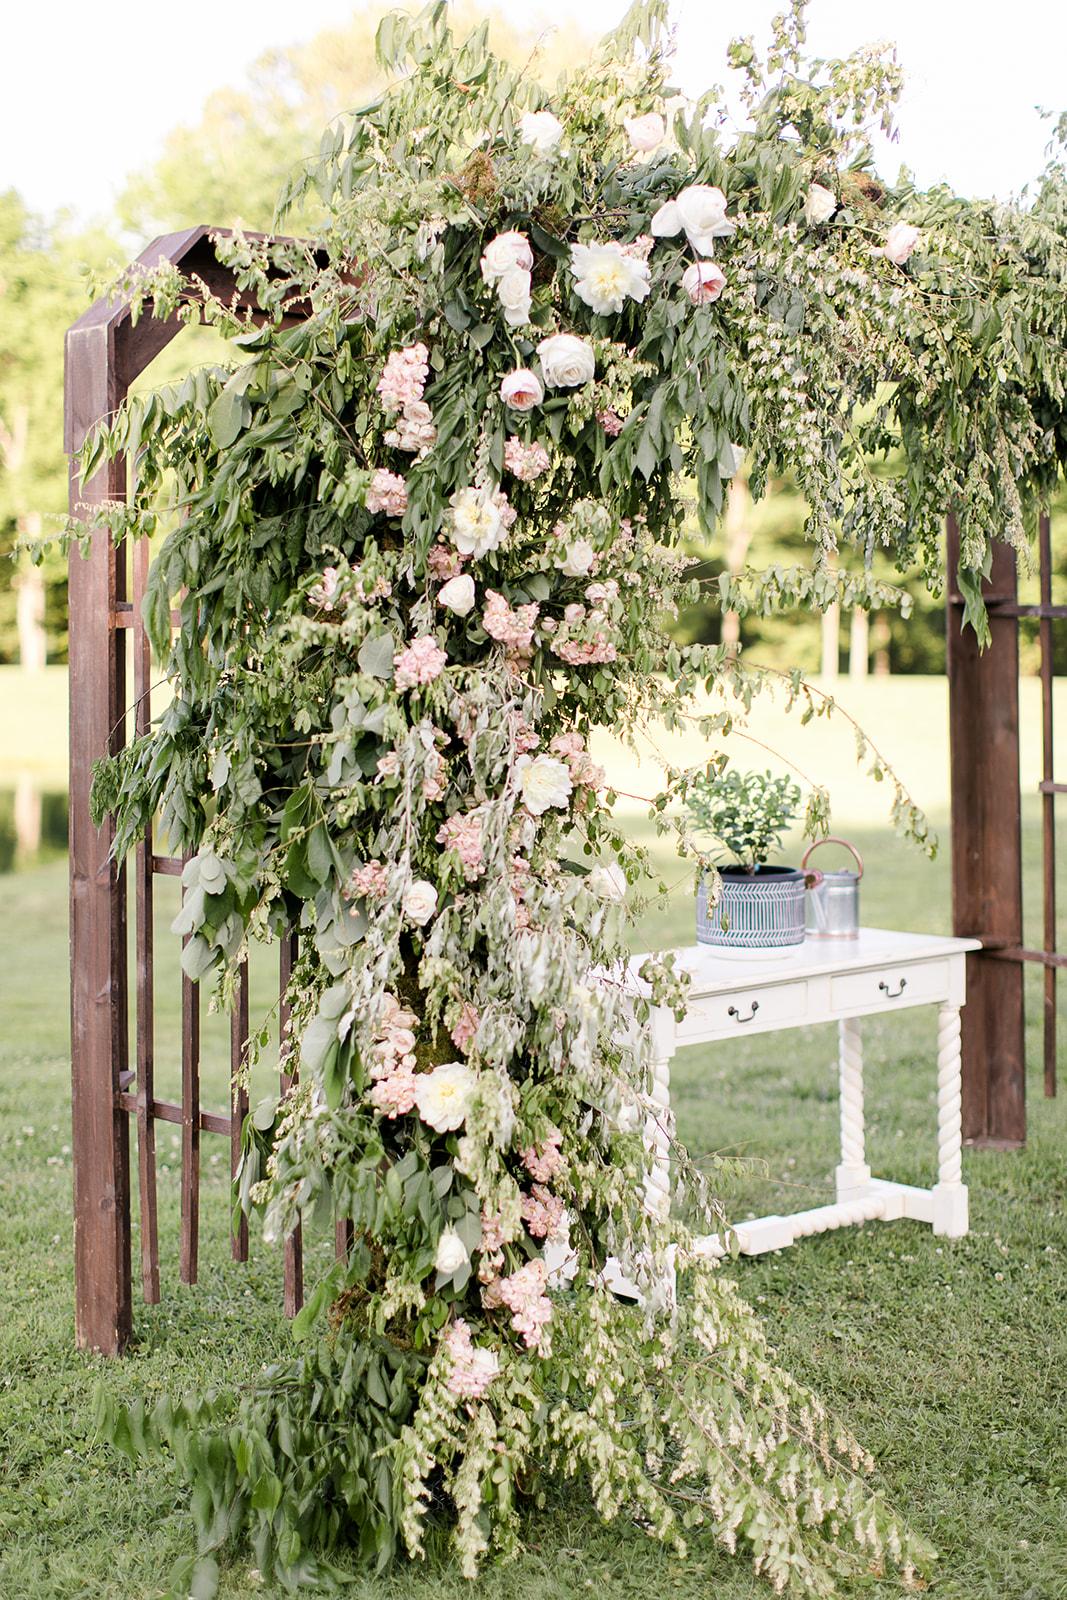 Abbey-Colby-wedding-72_websize.jpg